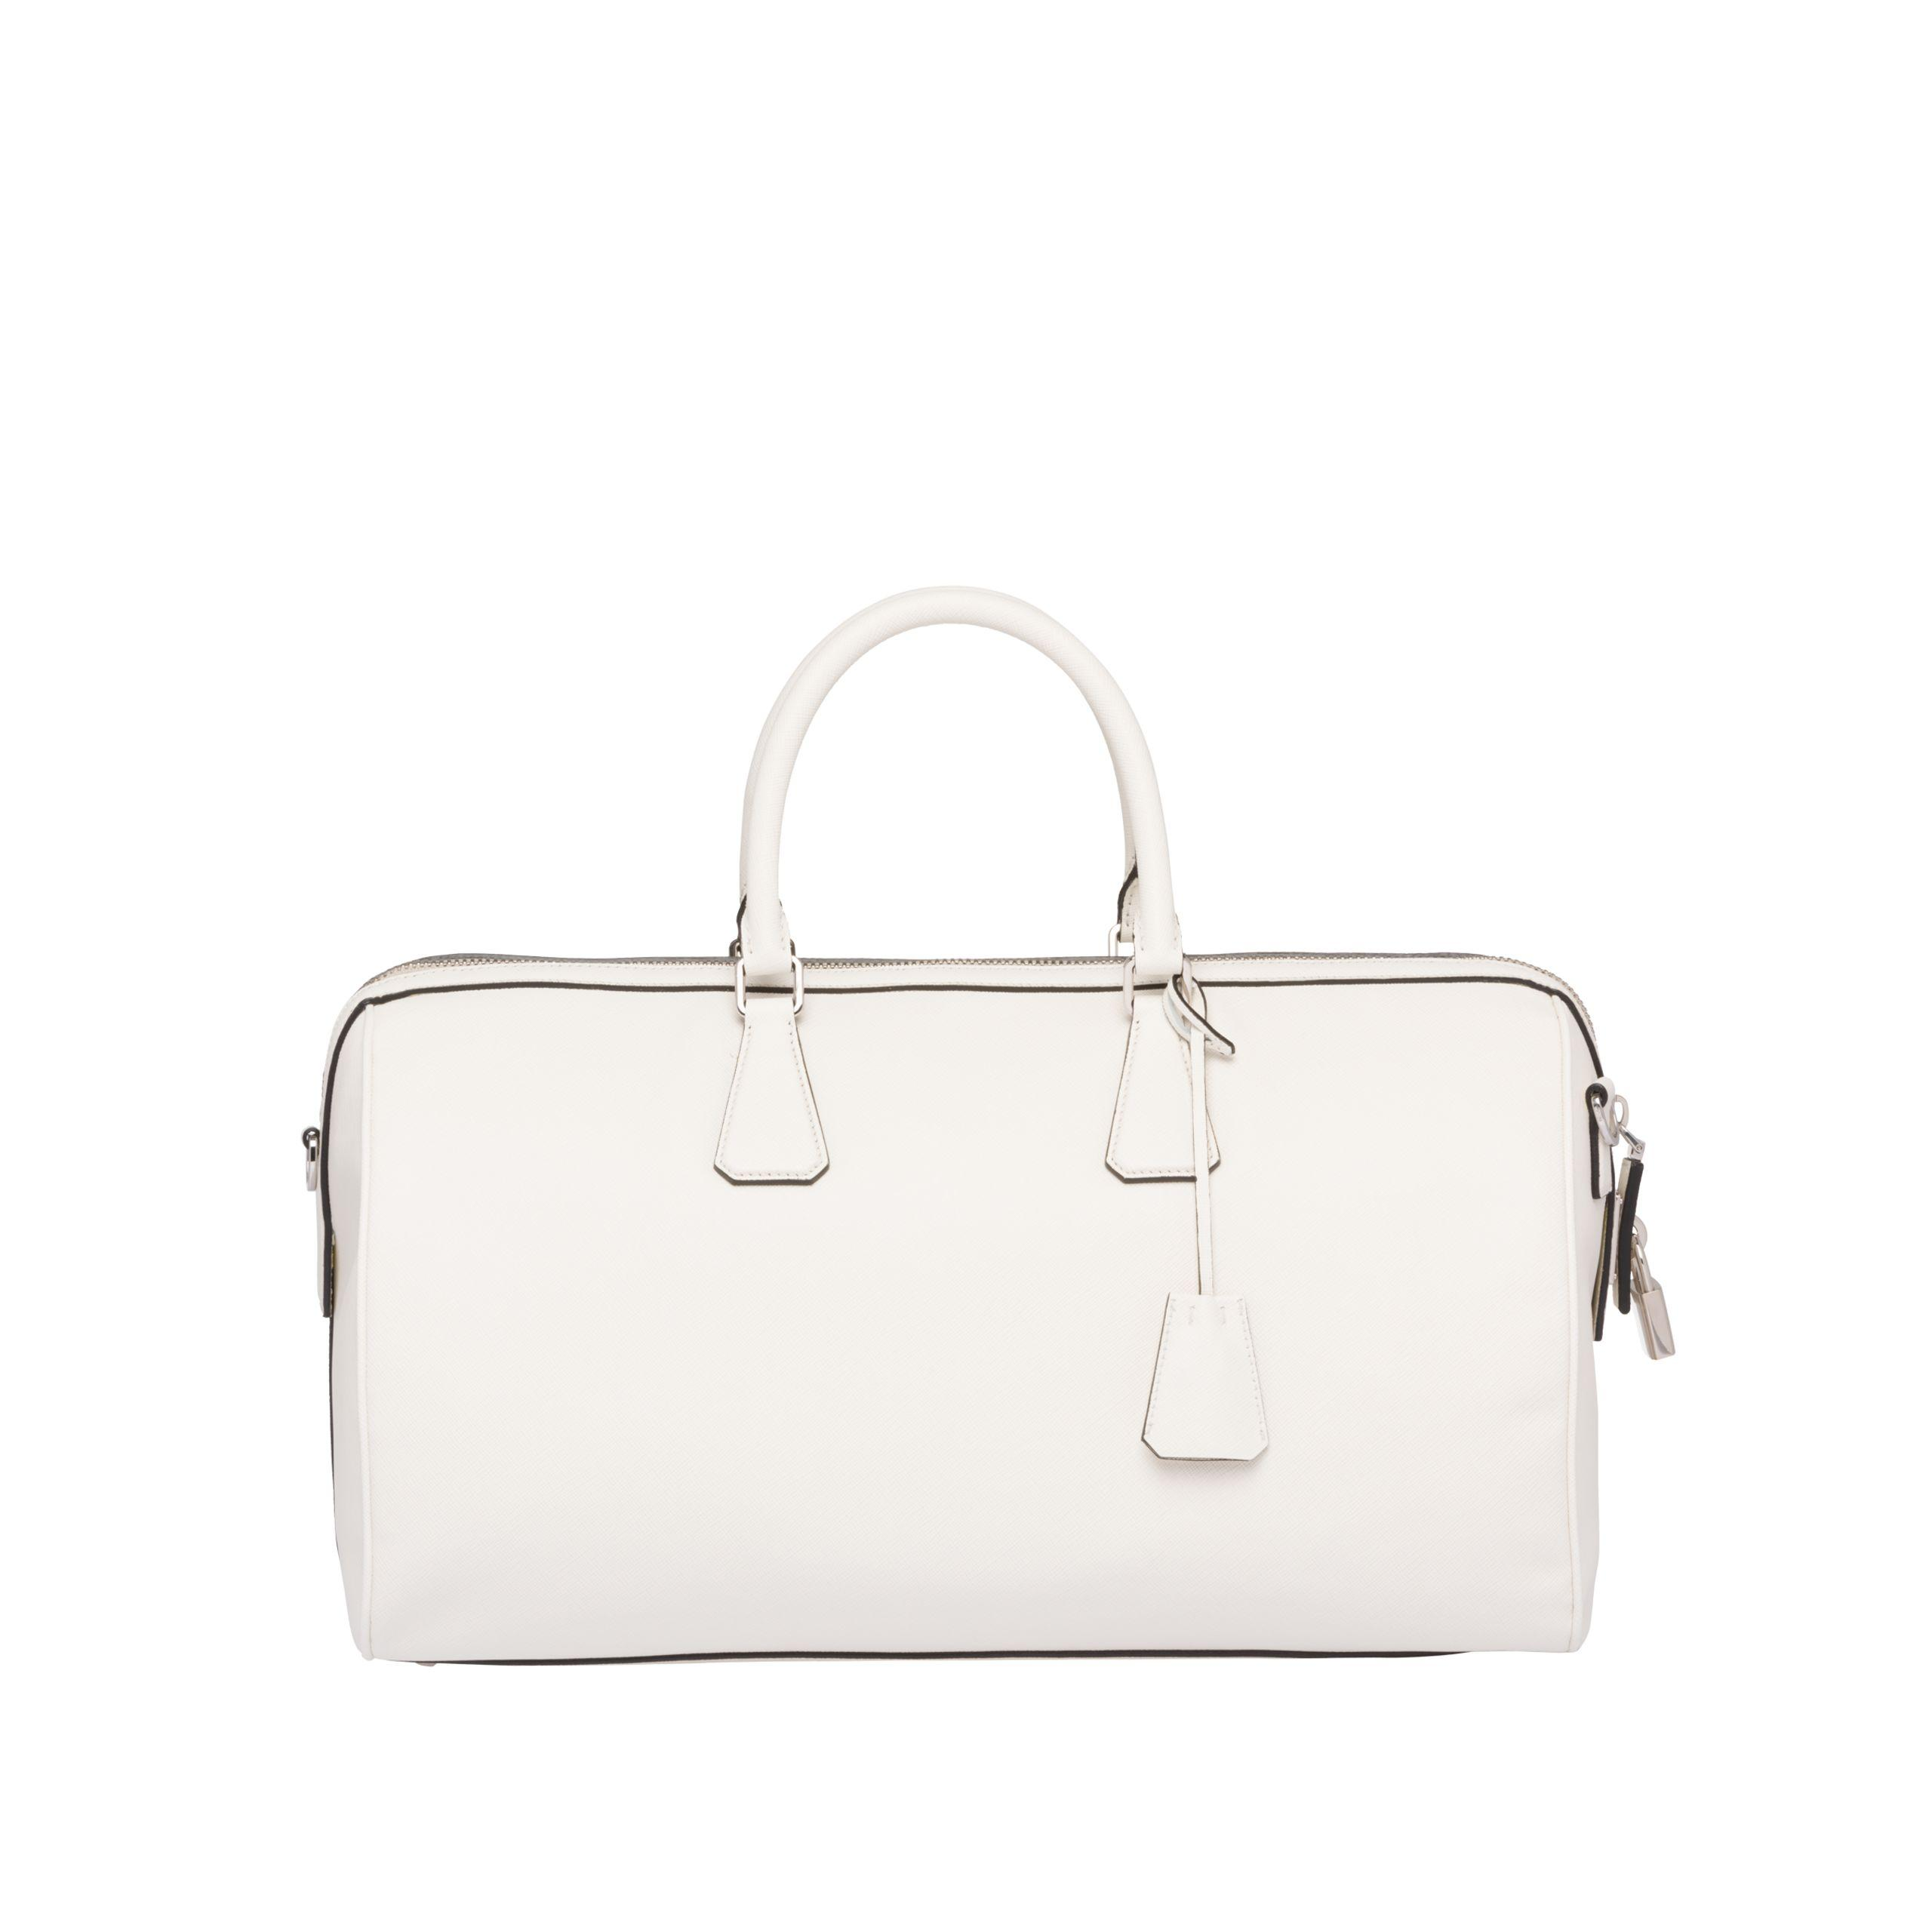 3fea50e35792 Prada - Multicolor Printed Saffiano Leather Travel Bag for Men - Lyst. View  fullscreen